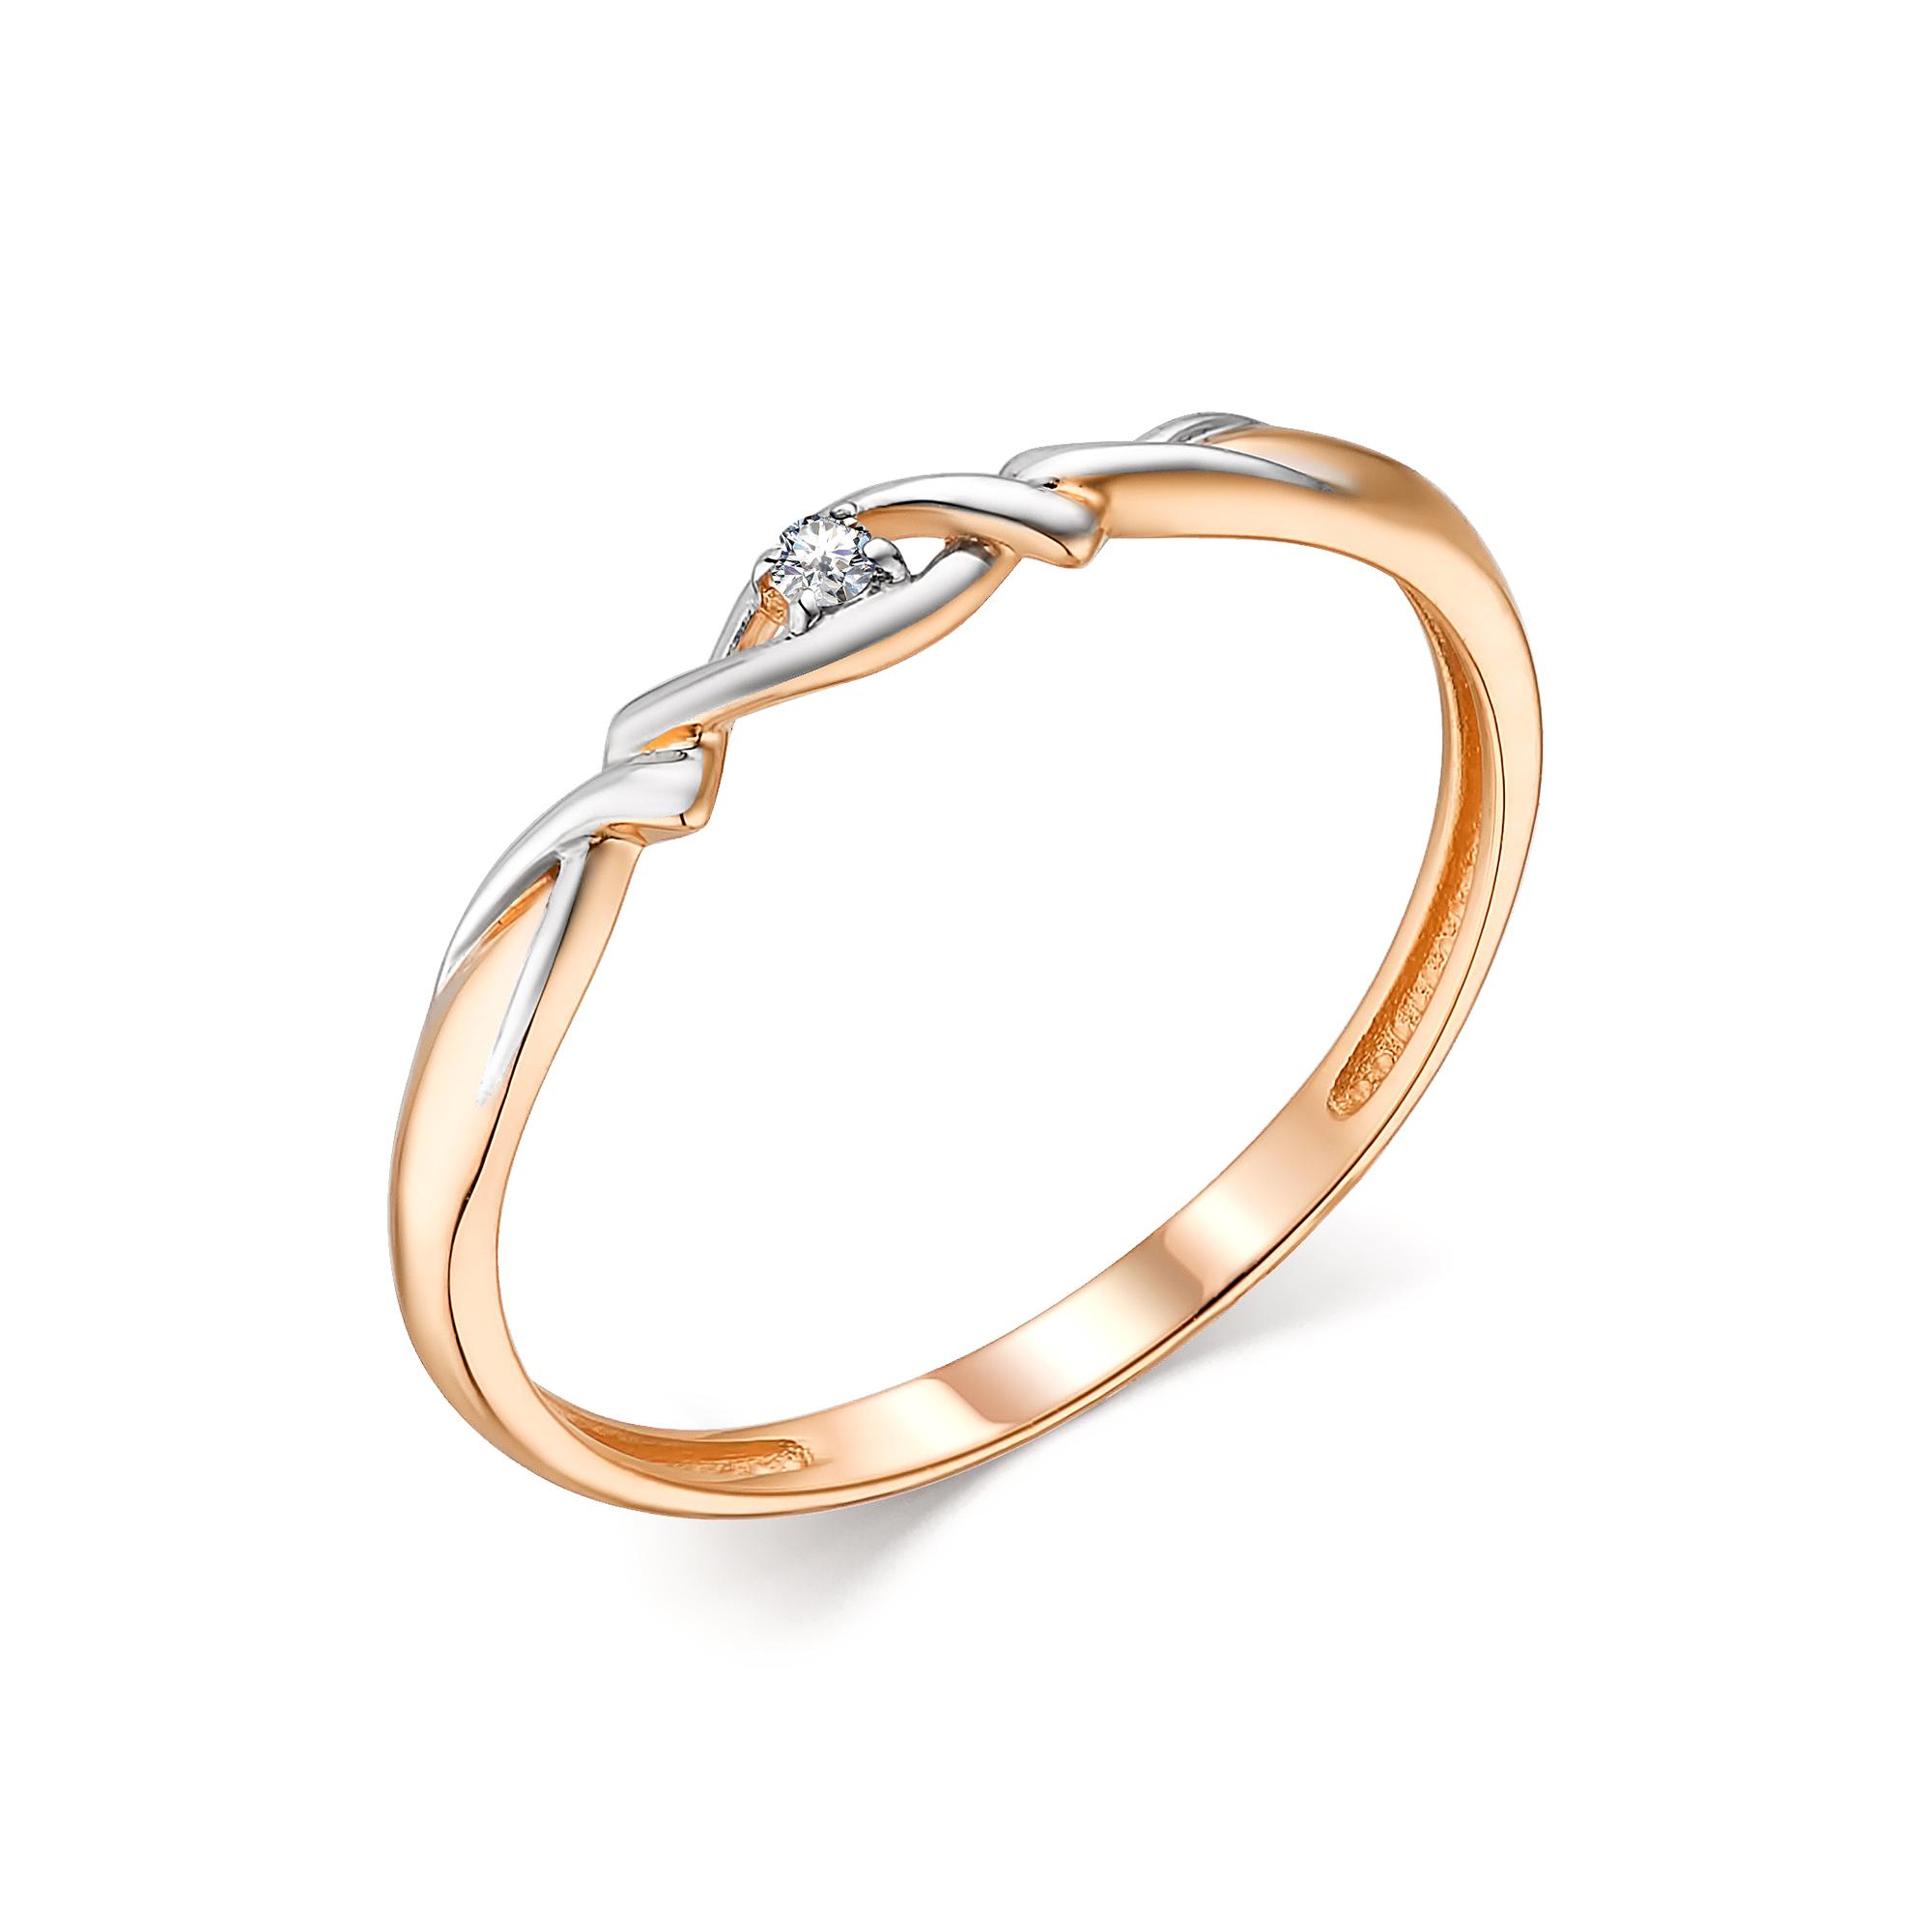 картинка кольцо 13804-100 1 бриллиант круг 57 0,015 60-90 4/5а 13804-100